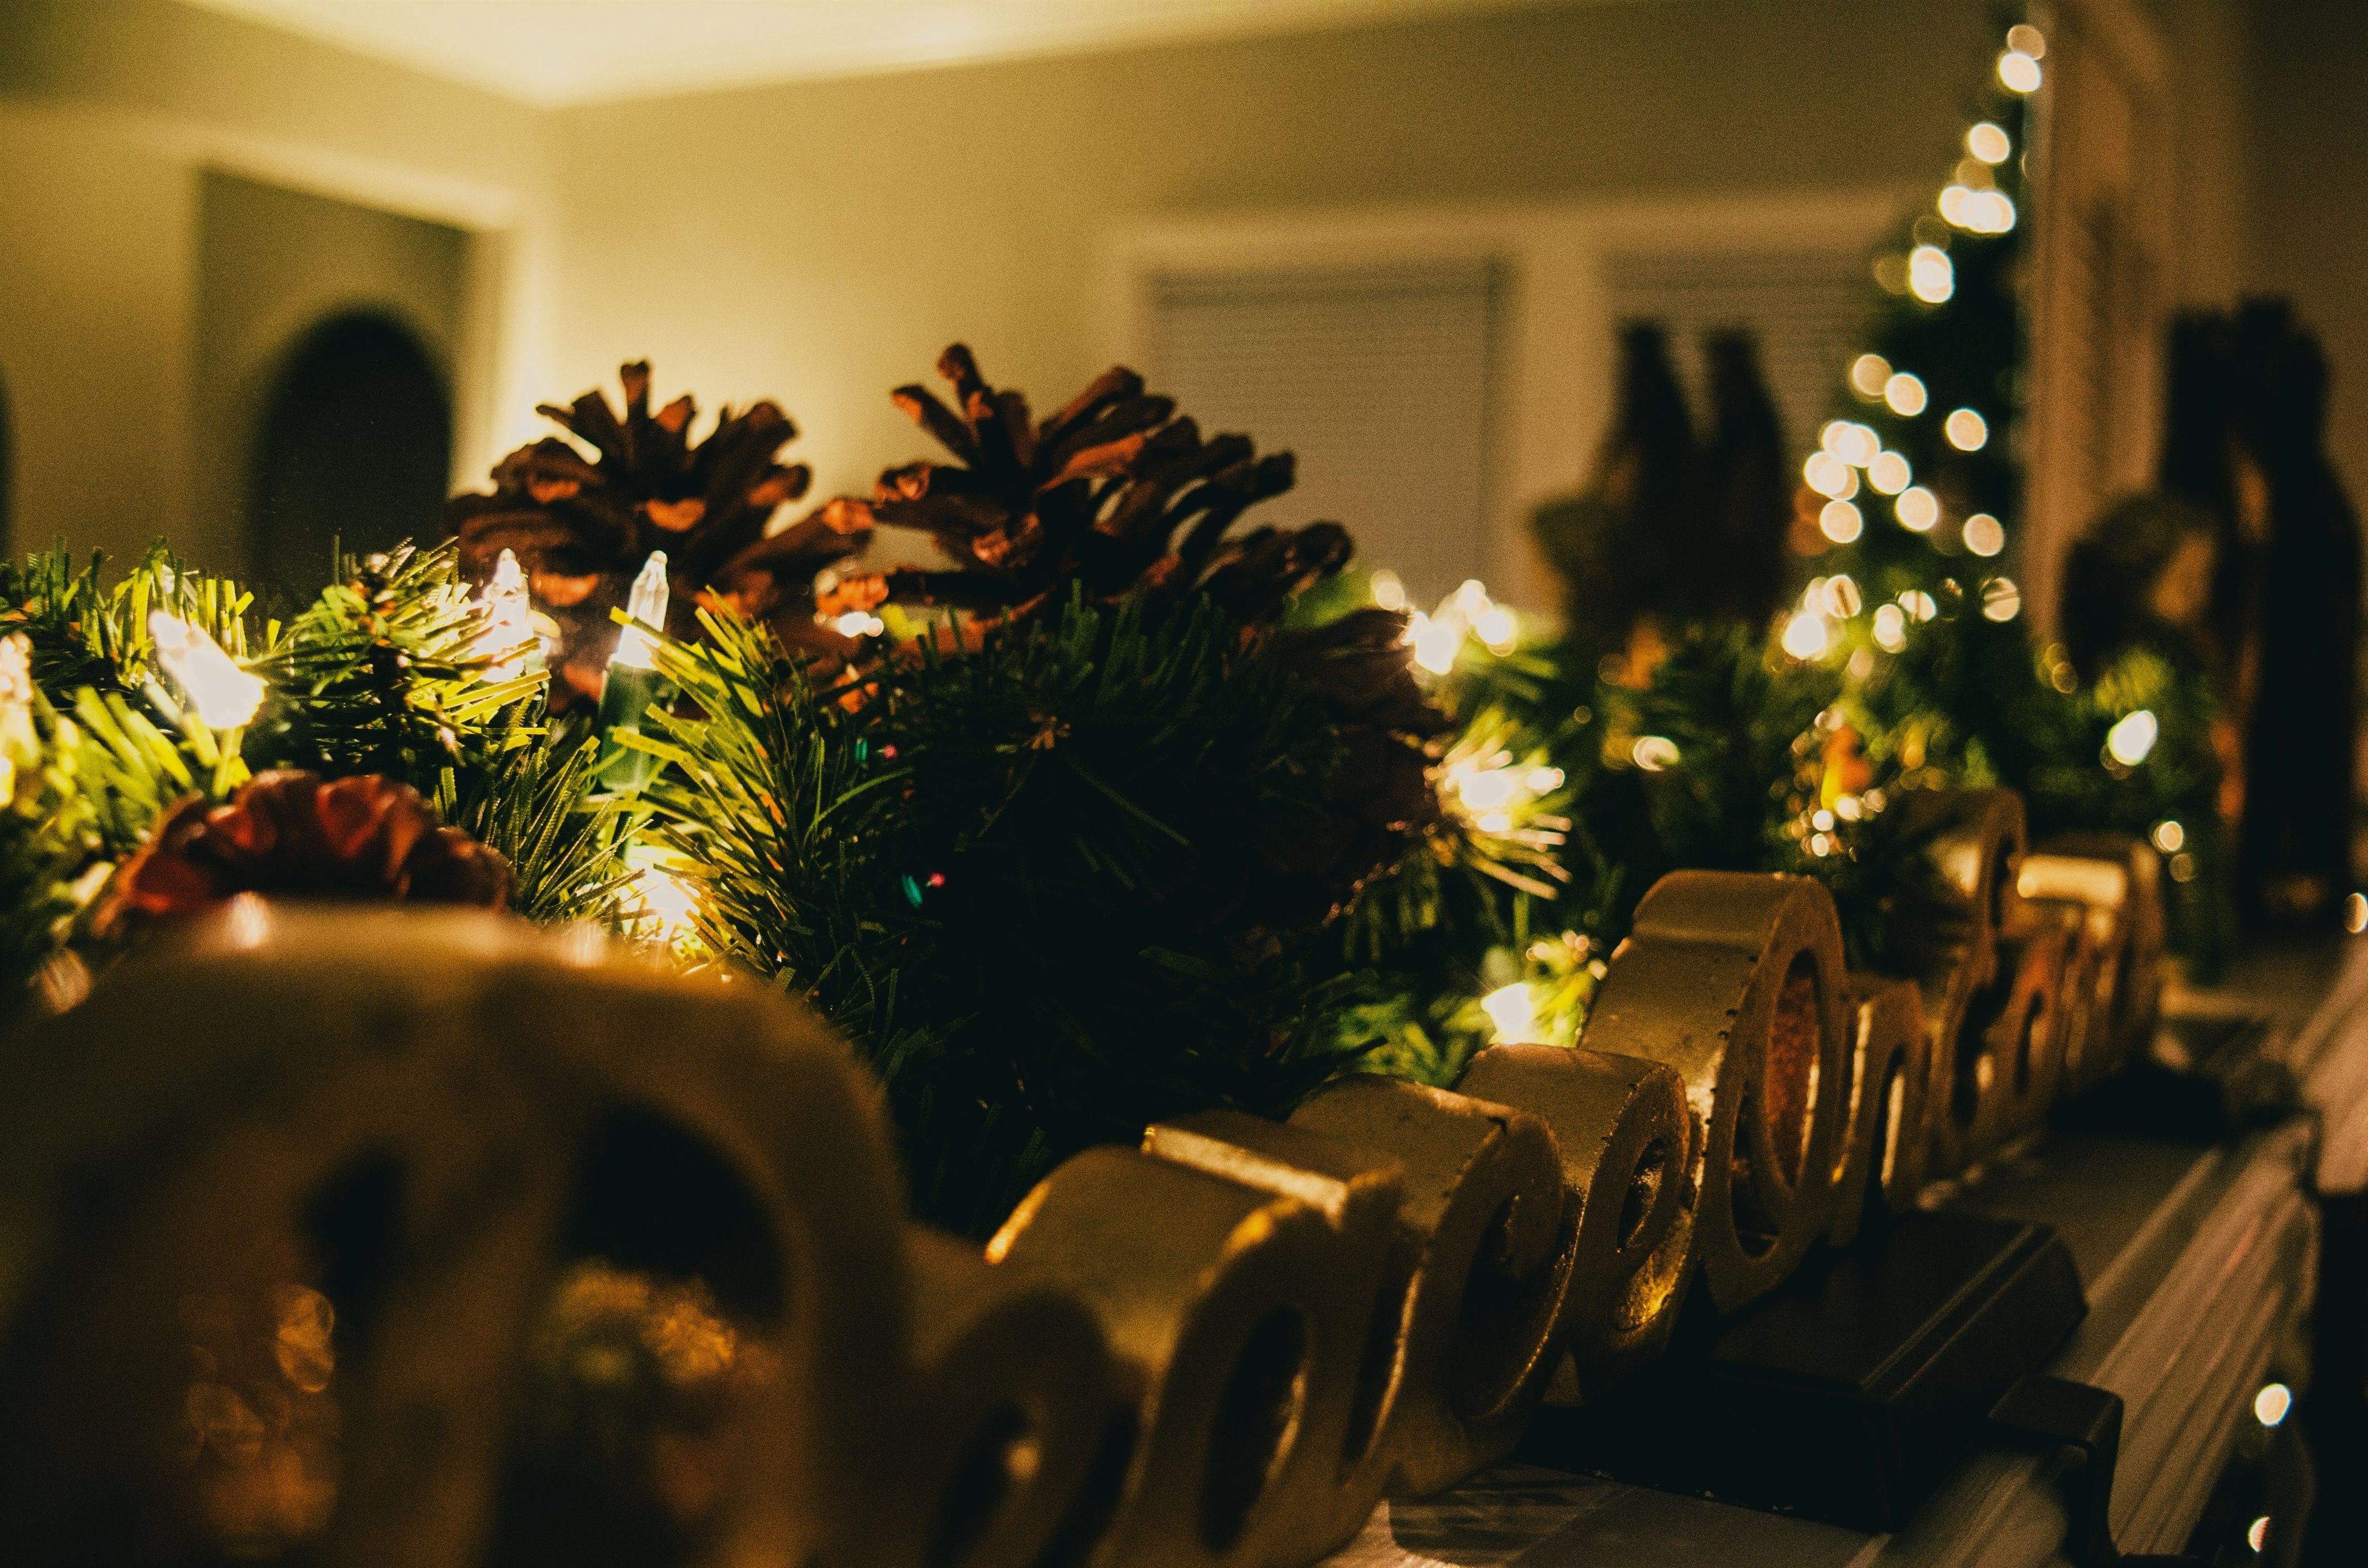 Home Decor Recycled Materials 749 20191017085838 62 Bulk Home Decor Wholesale Distributors Christmas Lights Images Craftsman Home Decor Home Decor Boxes